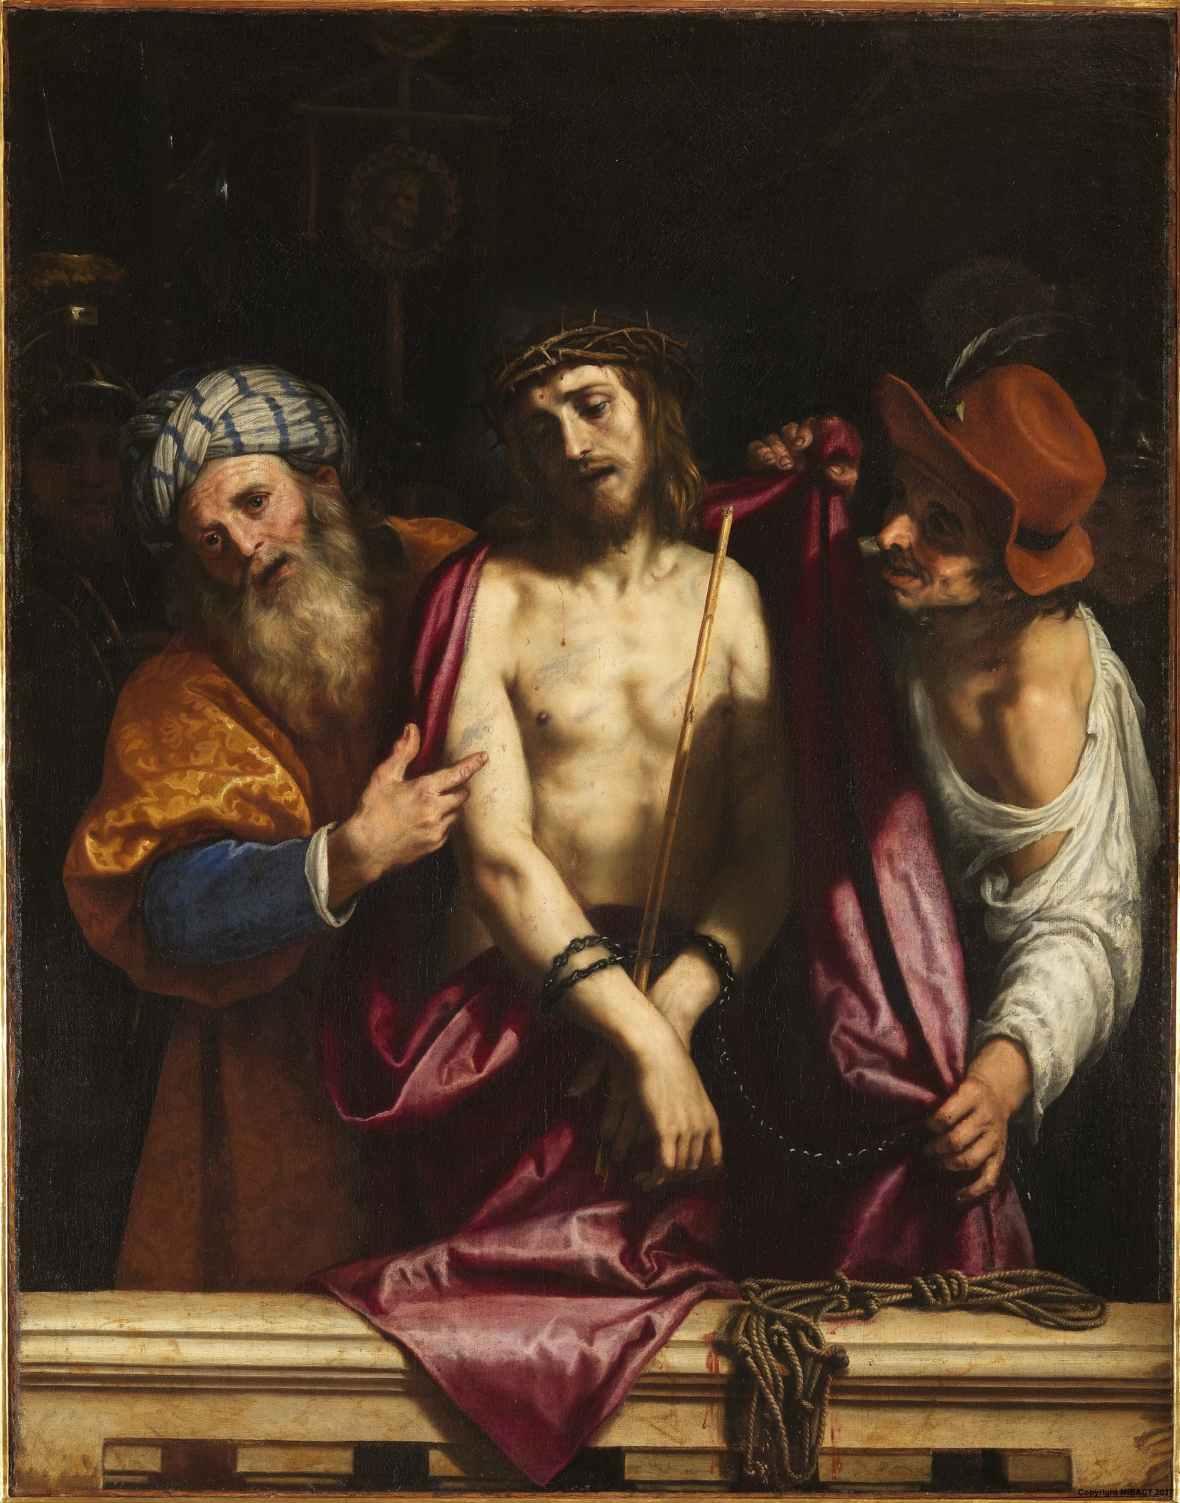 Lodovico Cigoli, Ecce Homo, 1607.